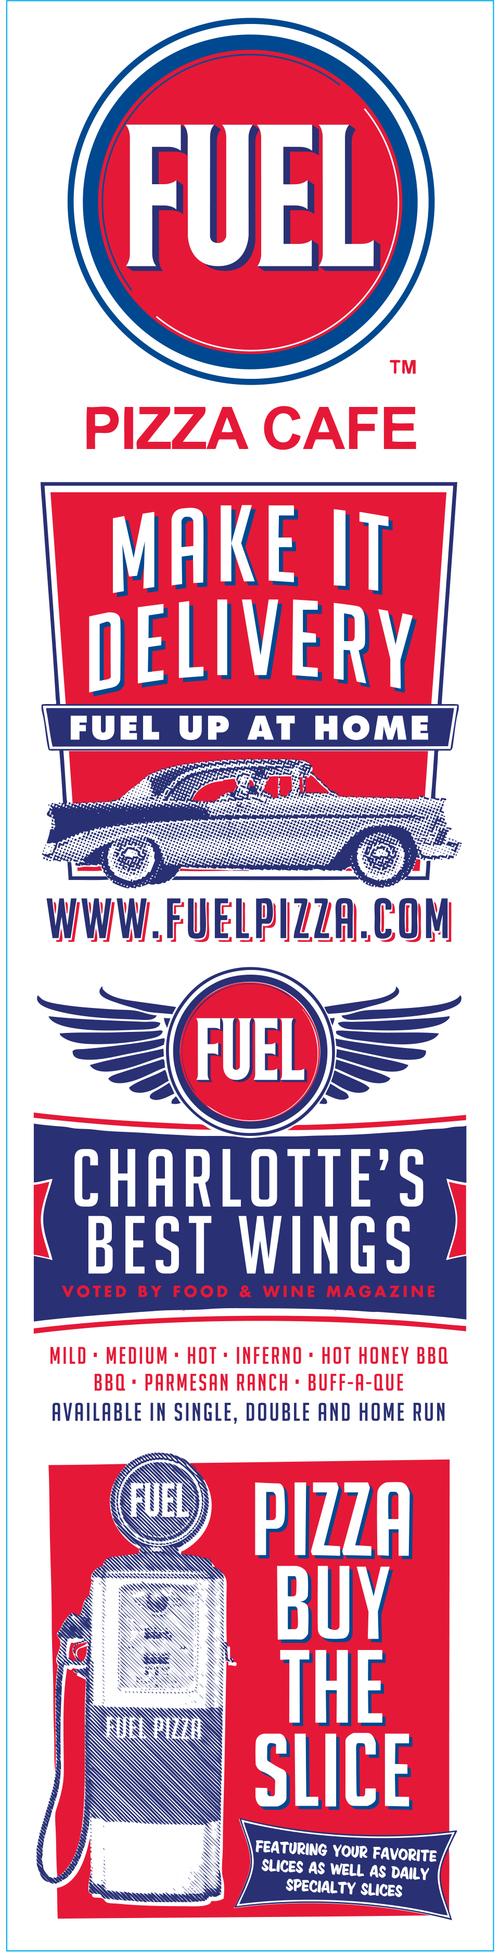 Fuel-Pizza-Cafe-02-7-2-10.jpg